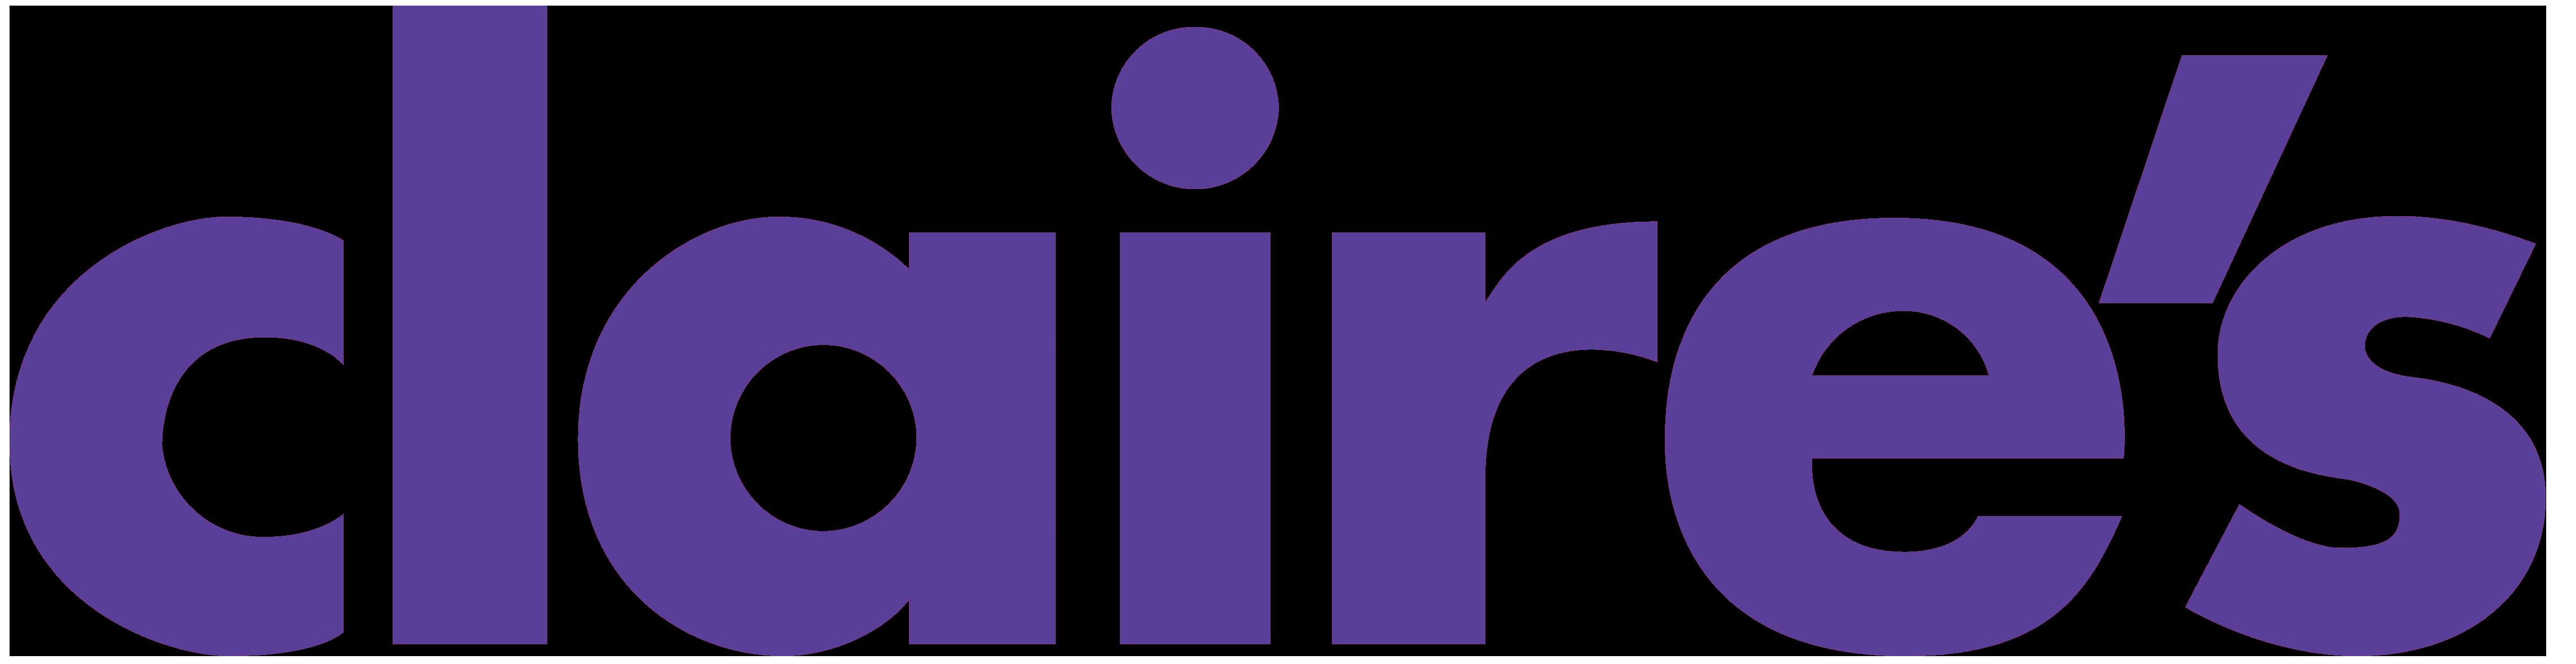 Claires logo-1